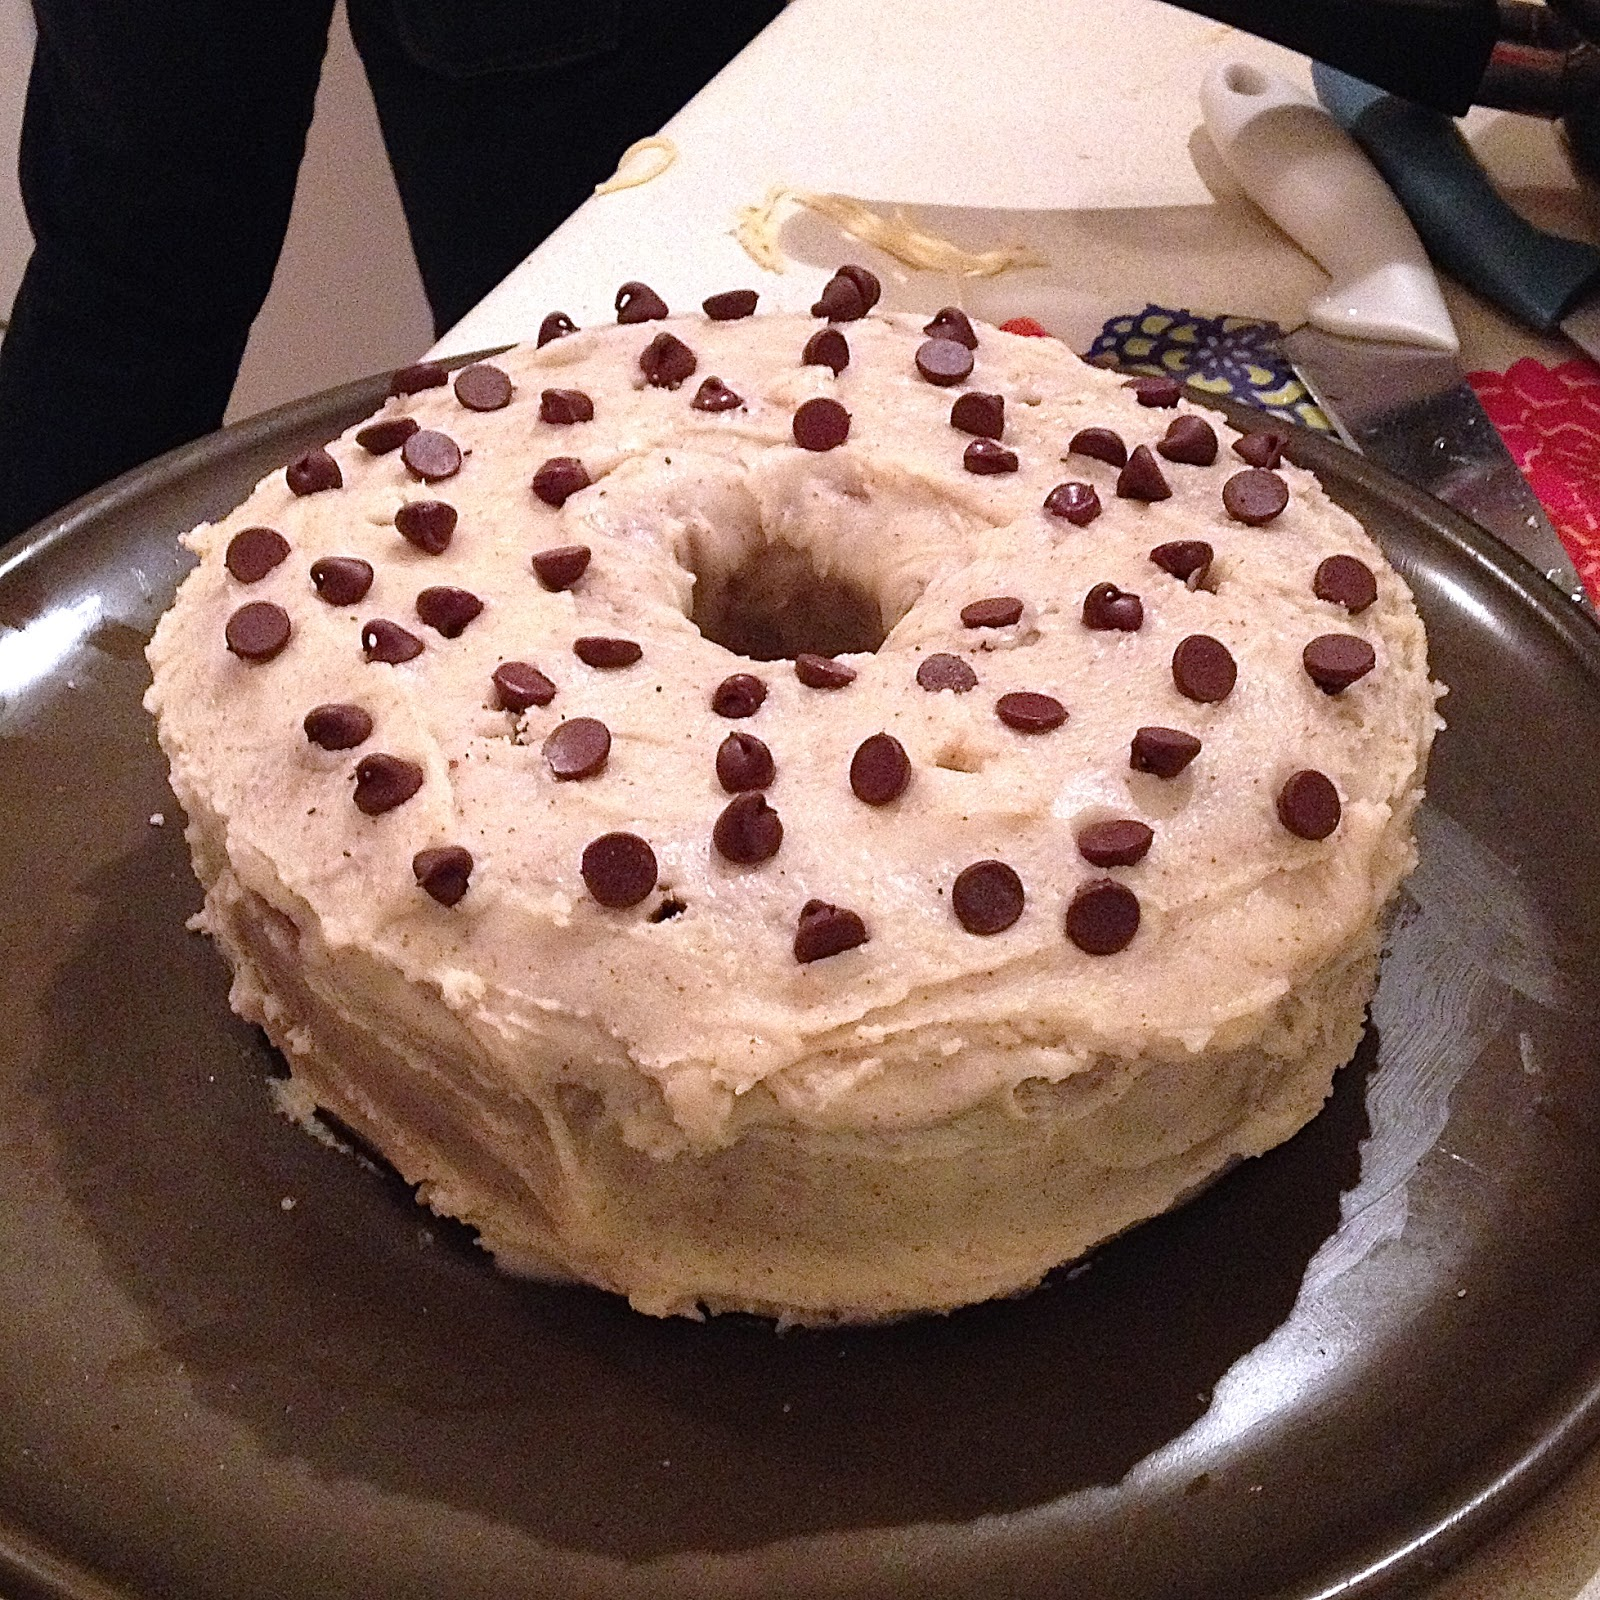 My Icing Sugar Is Turning Liquid On The Cake